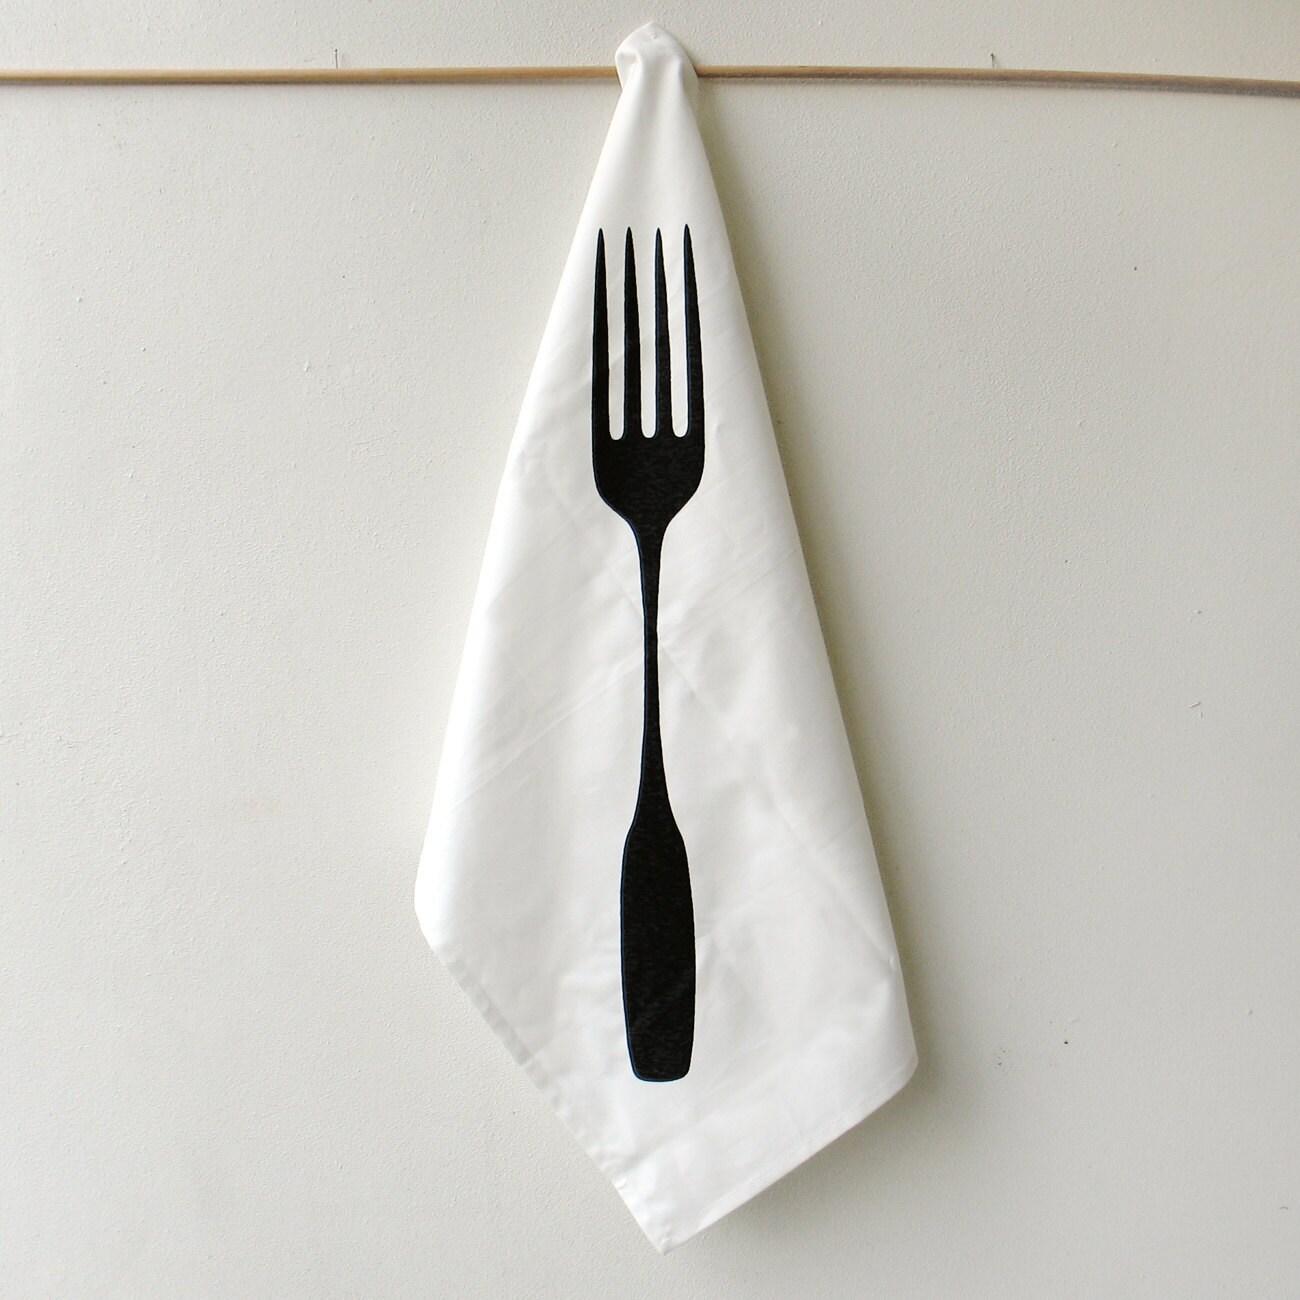 SALE Eco Friendly Kitchen Gift : Giant Fork Tea Towel - Xenotees